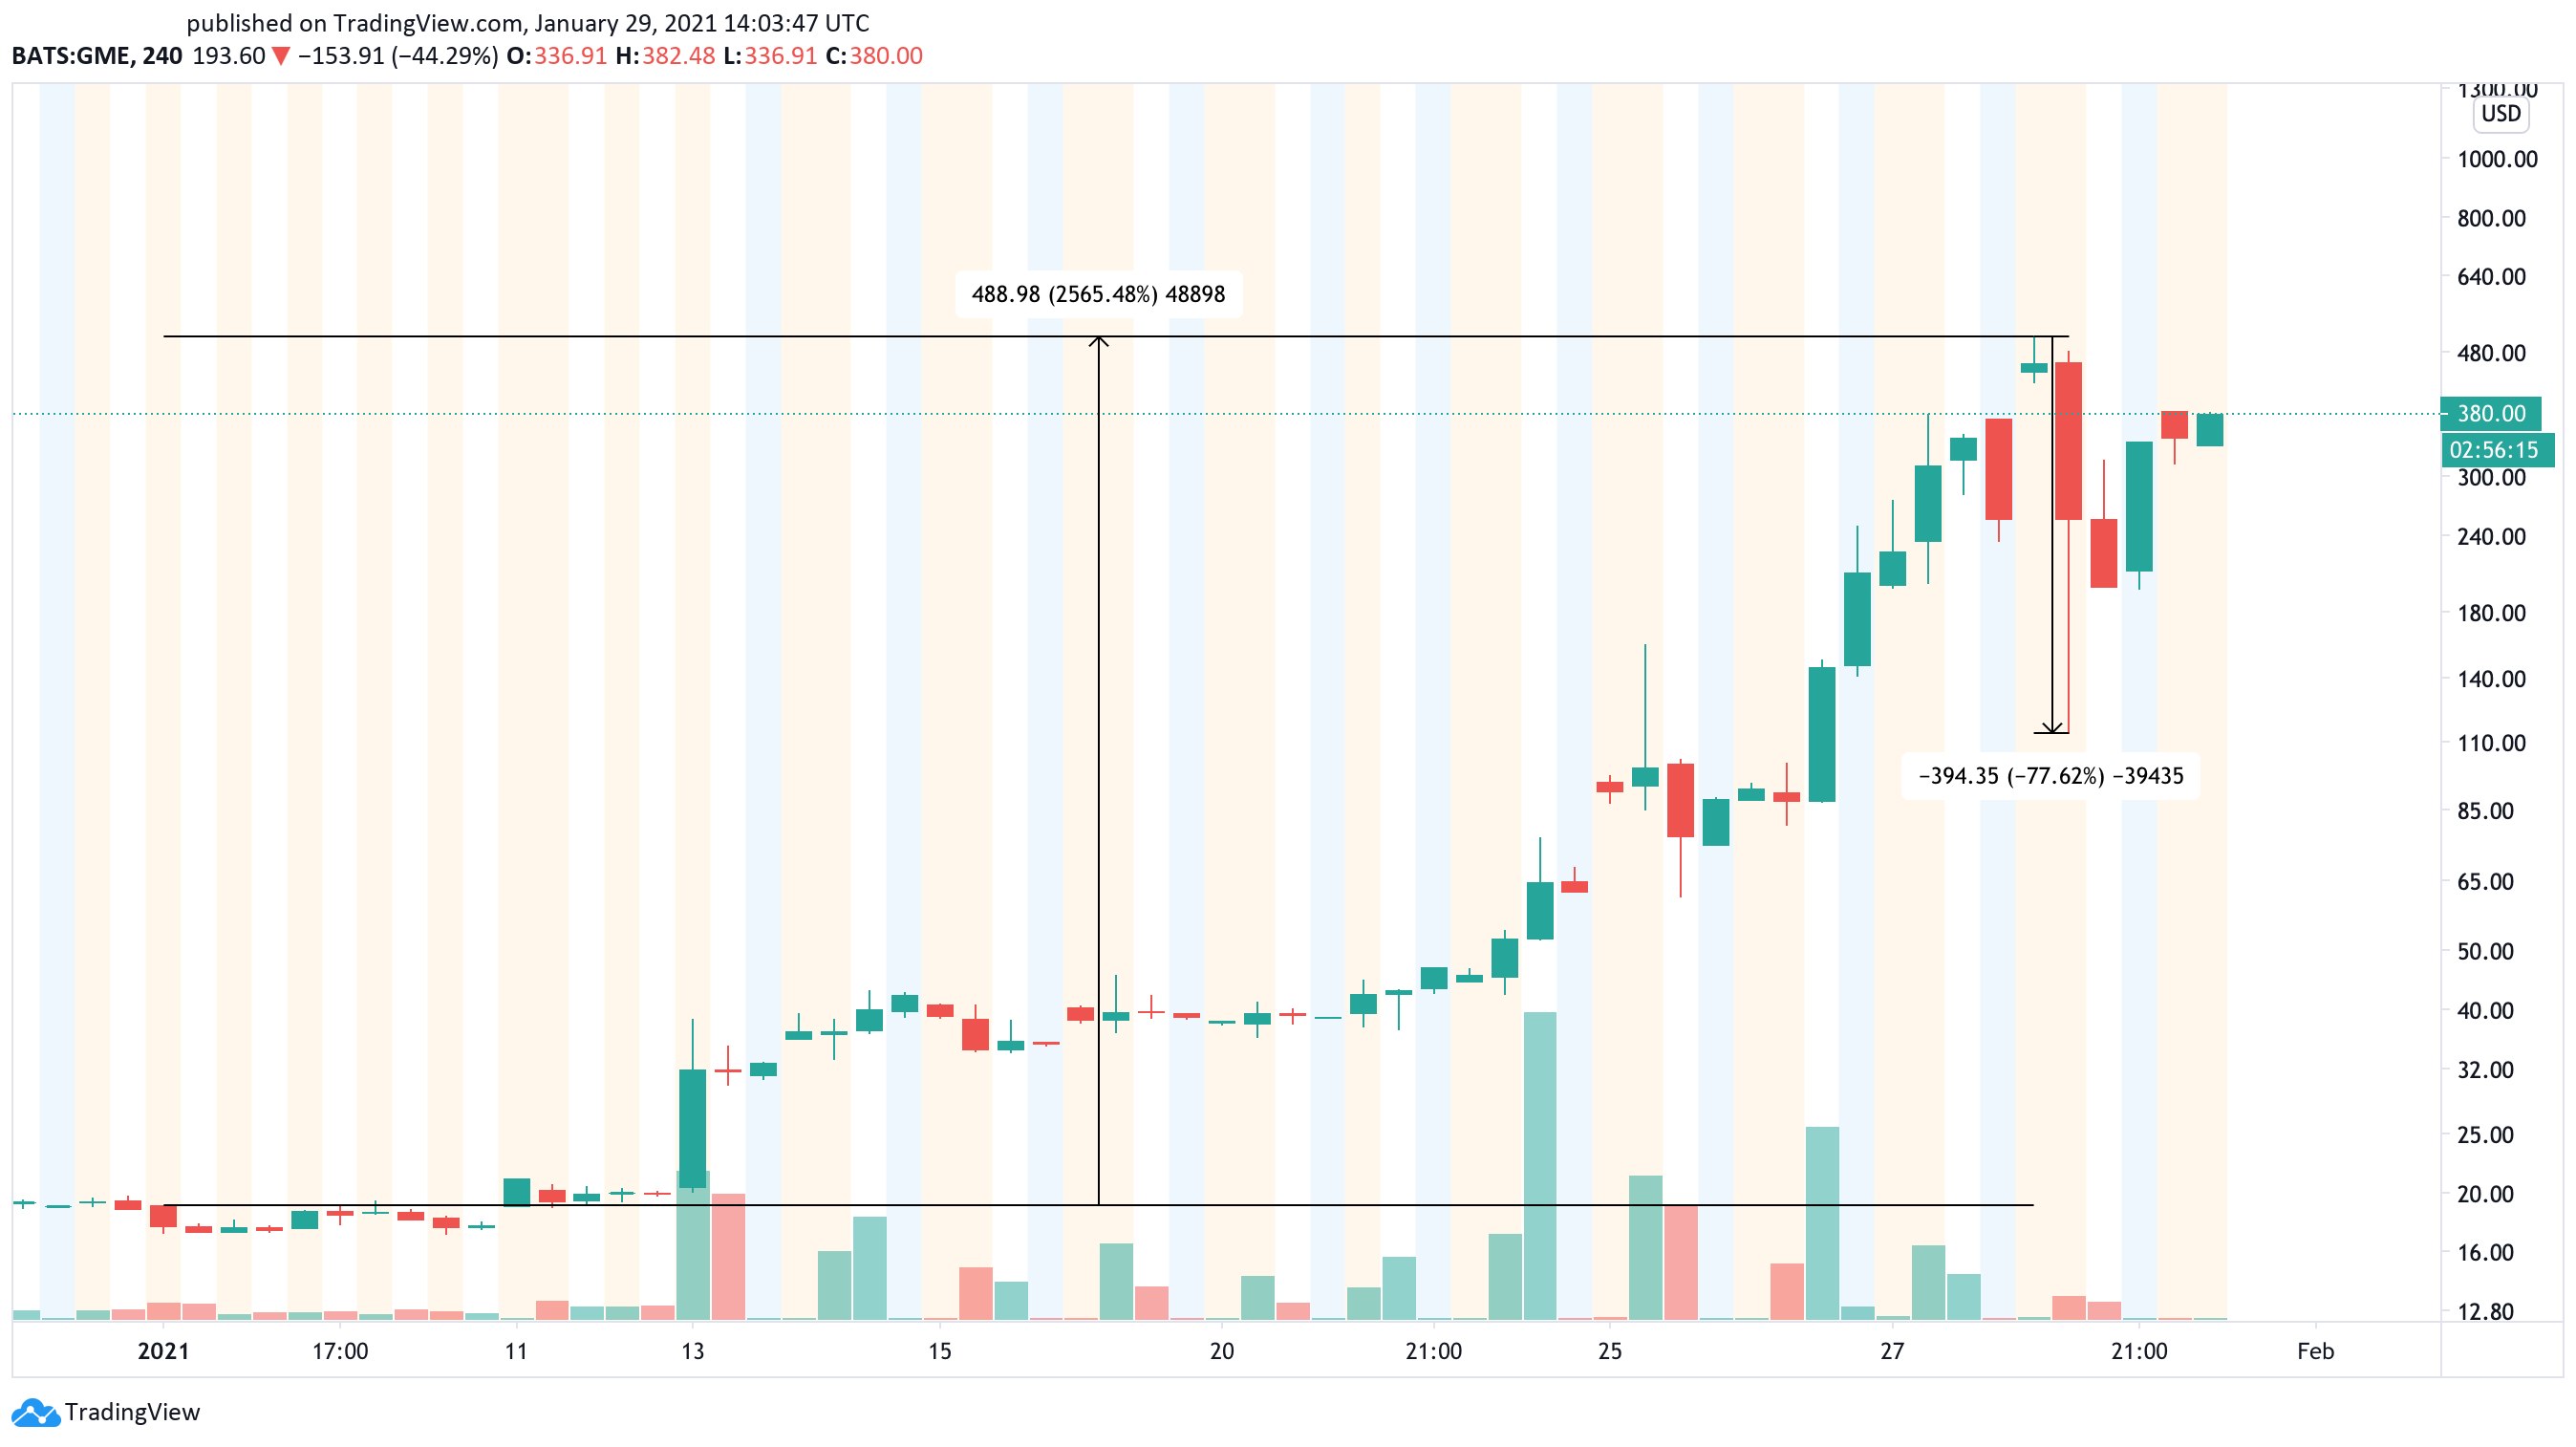 GameStop US dollar price chart